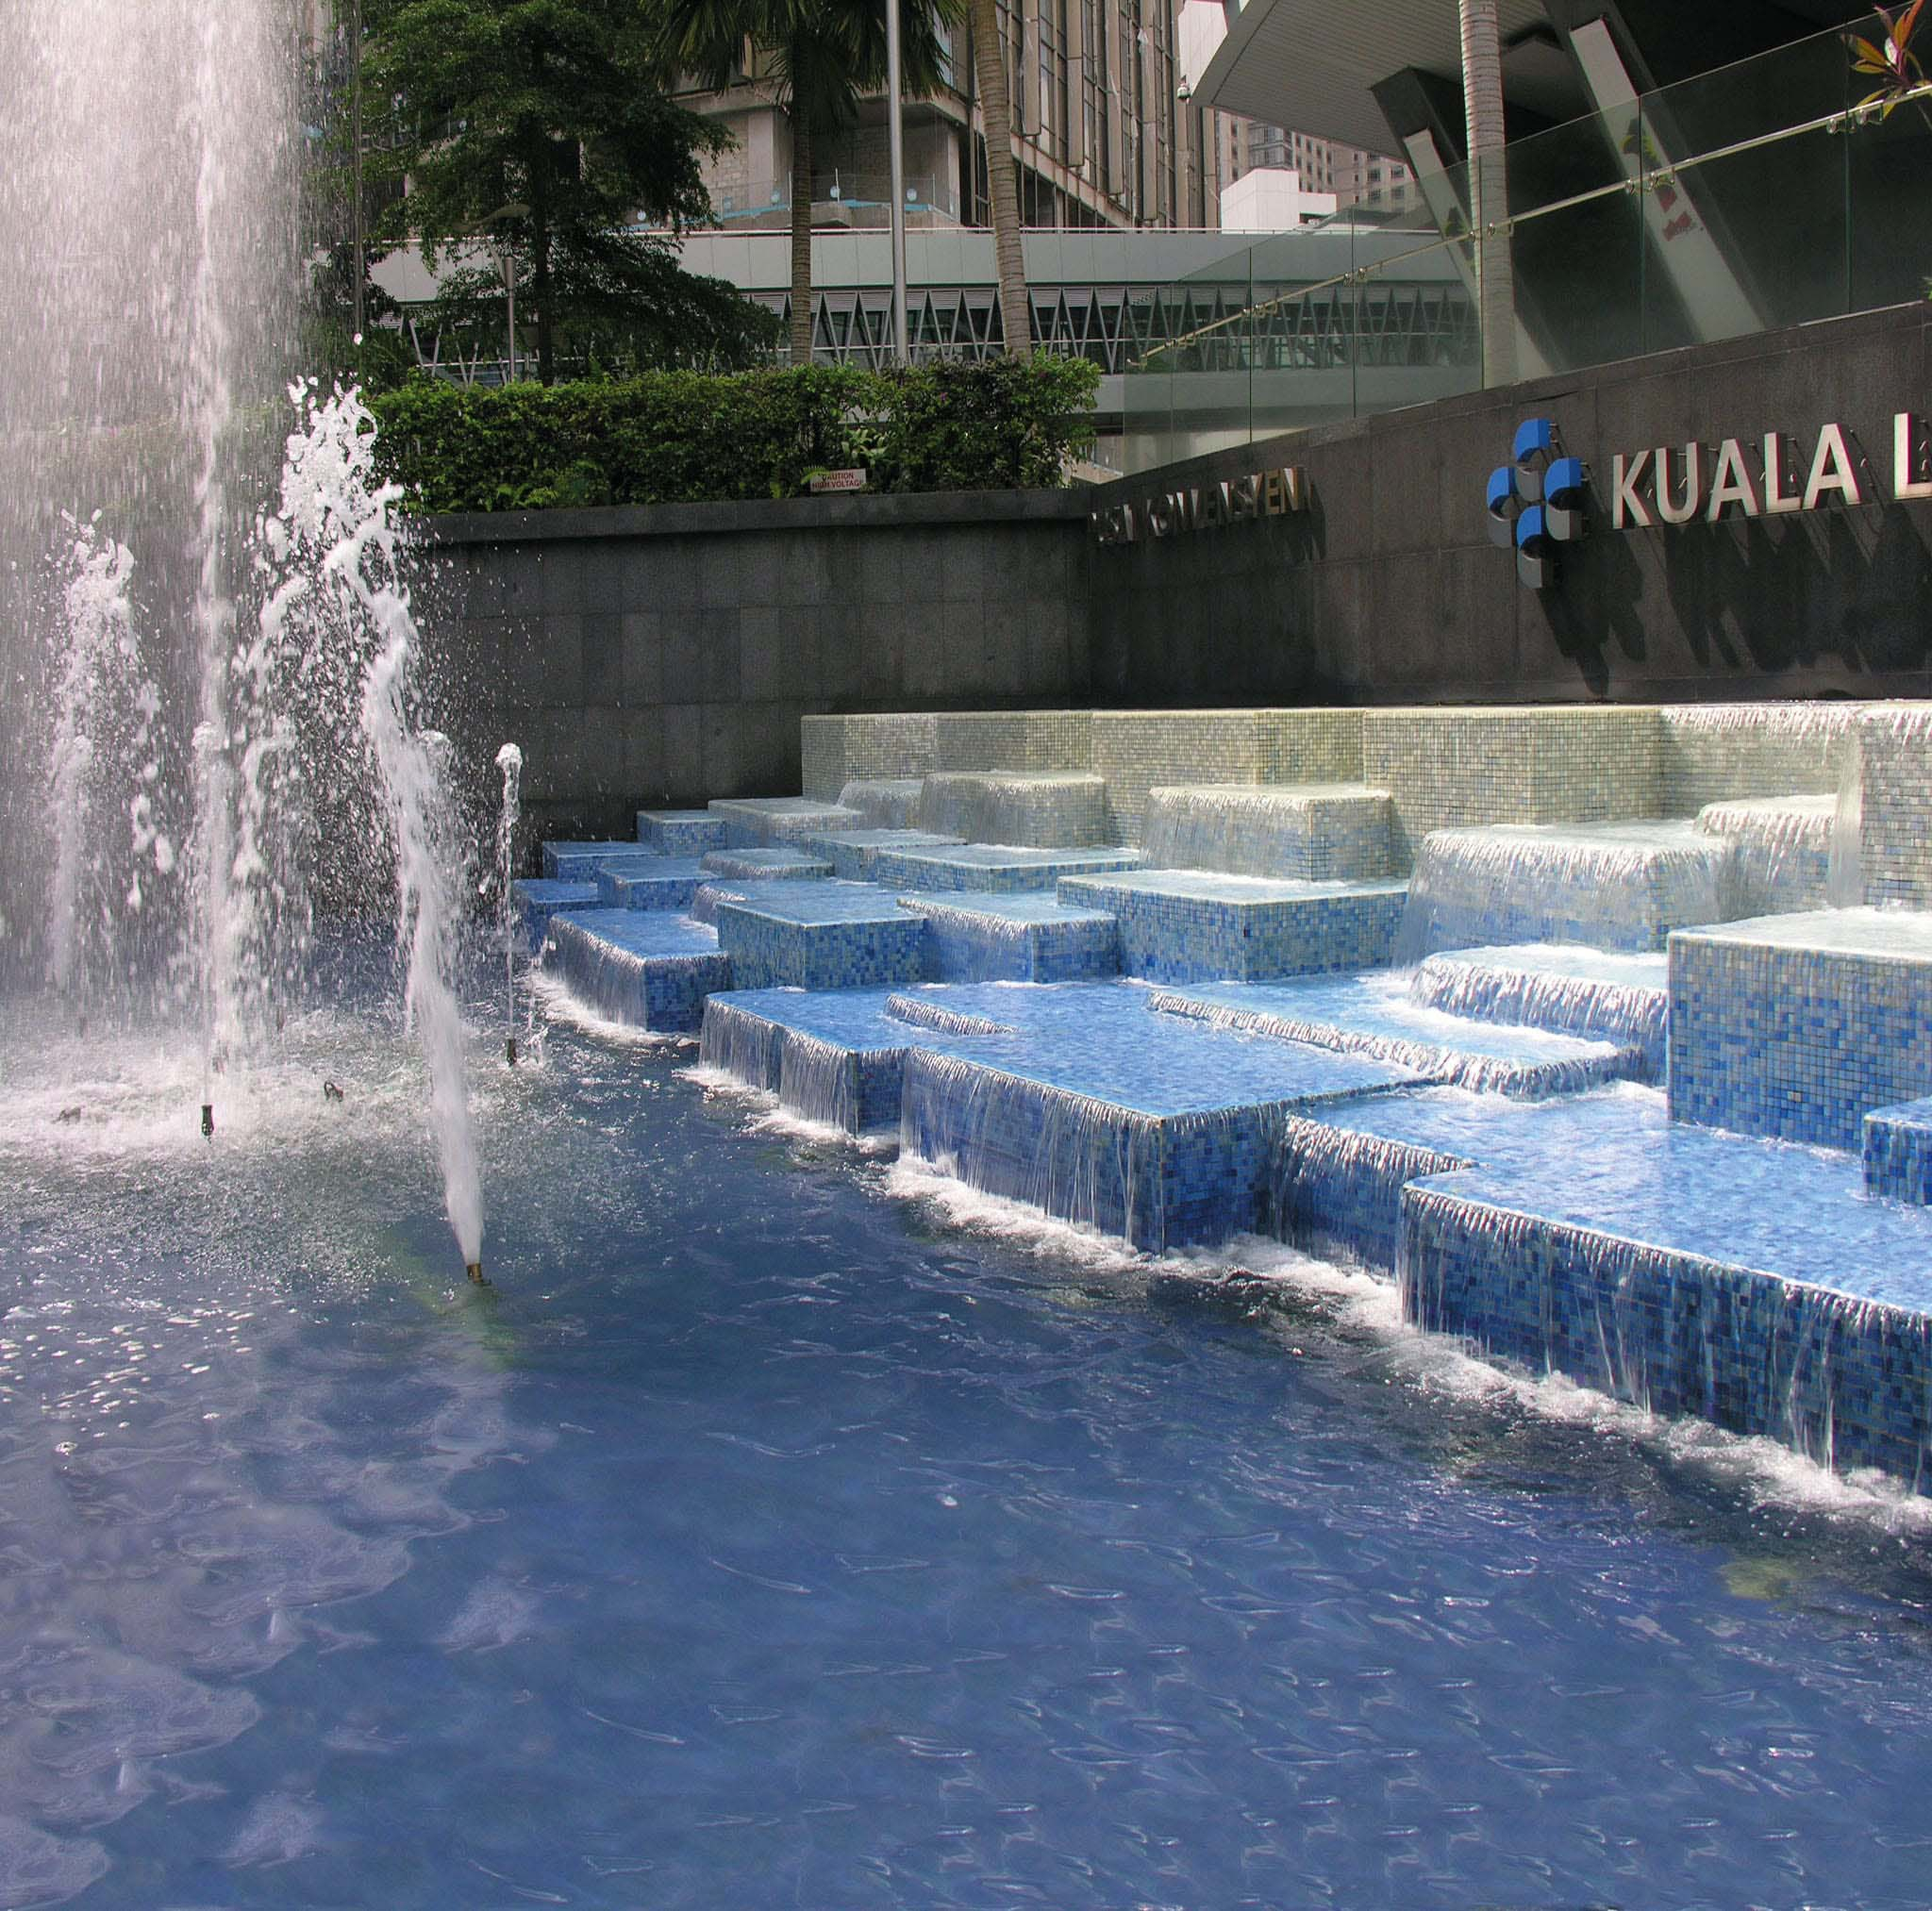 Kuala Lumpur Convention Center in Malaysia